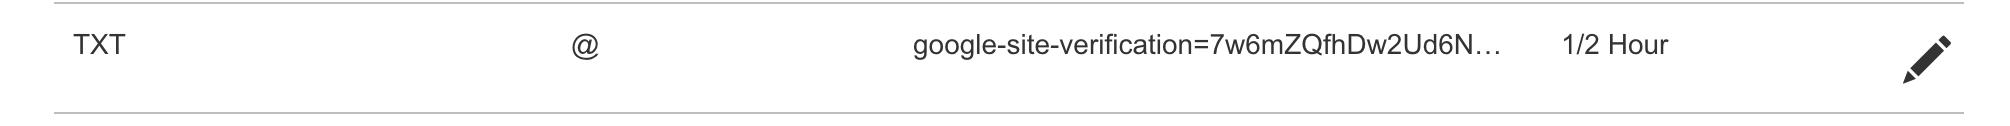 TXT-value-for-google-verification